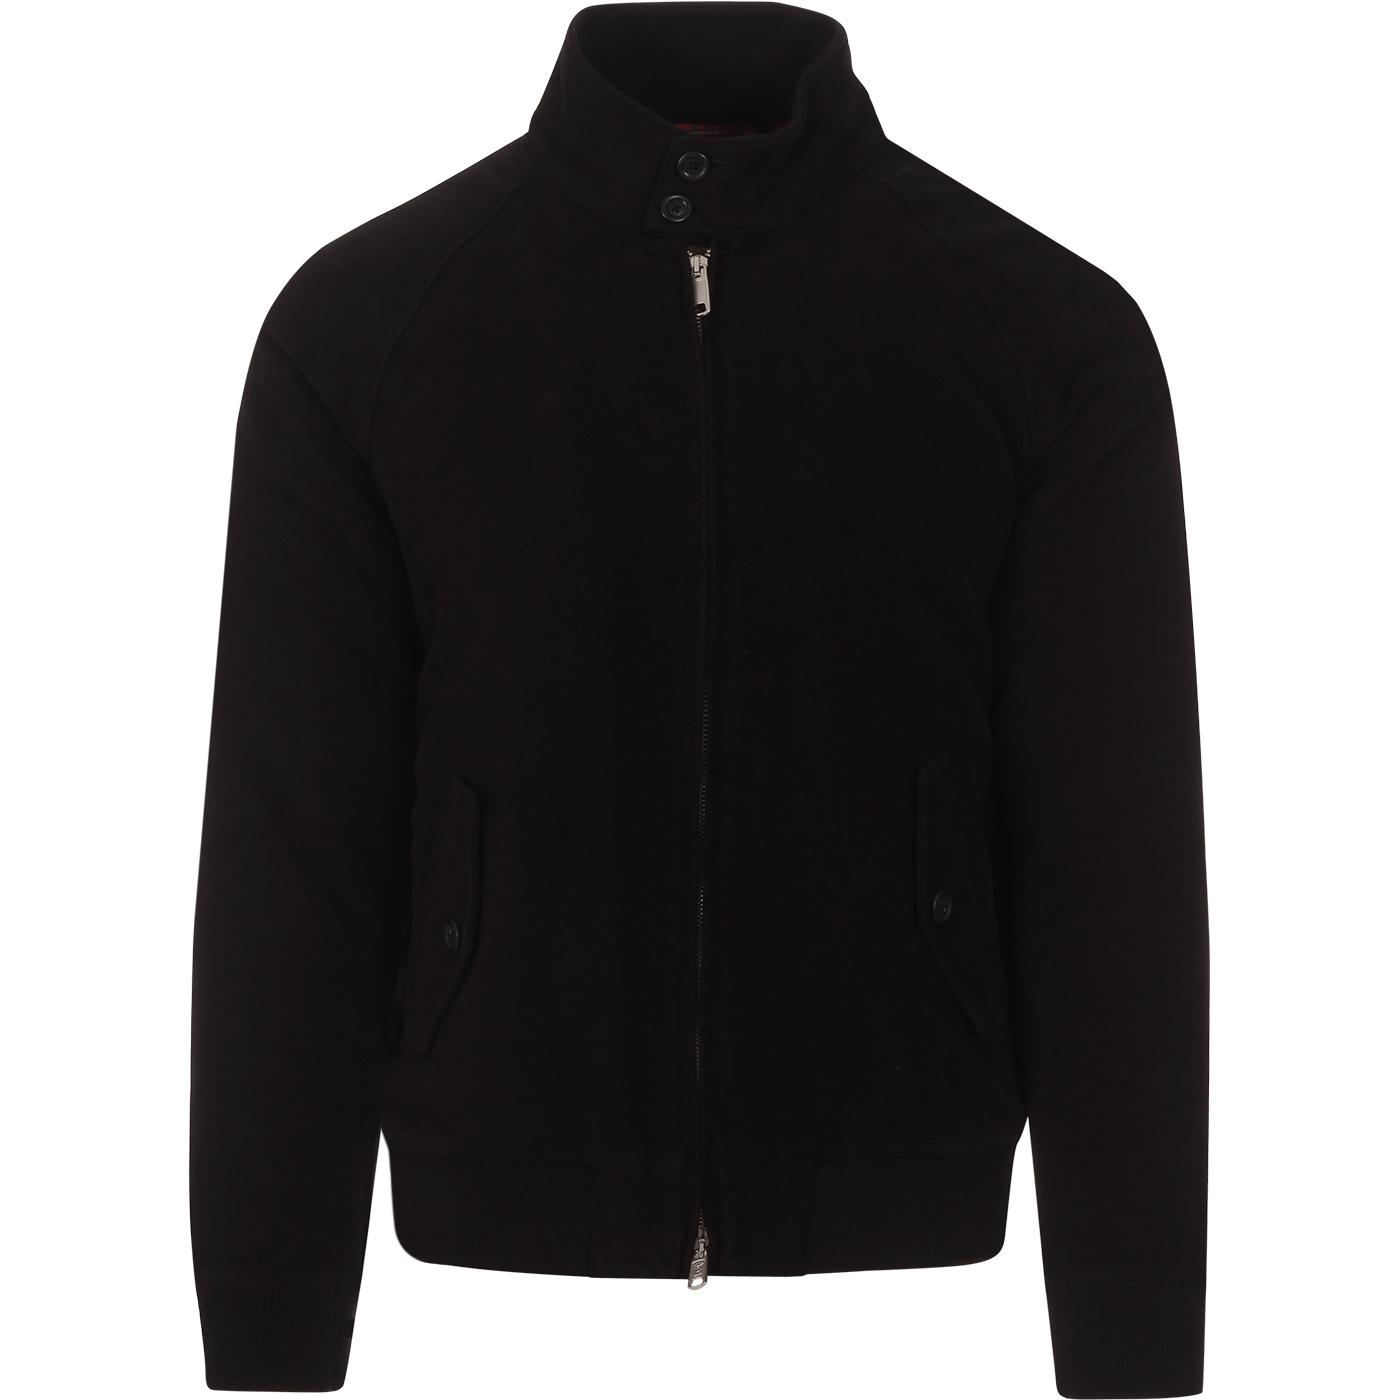 BARACUTA G9 Moleskin Mod Harrington Jacket (Black)